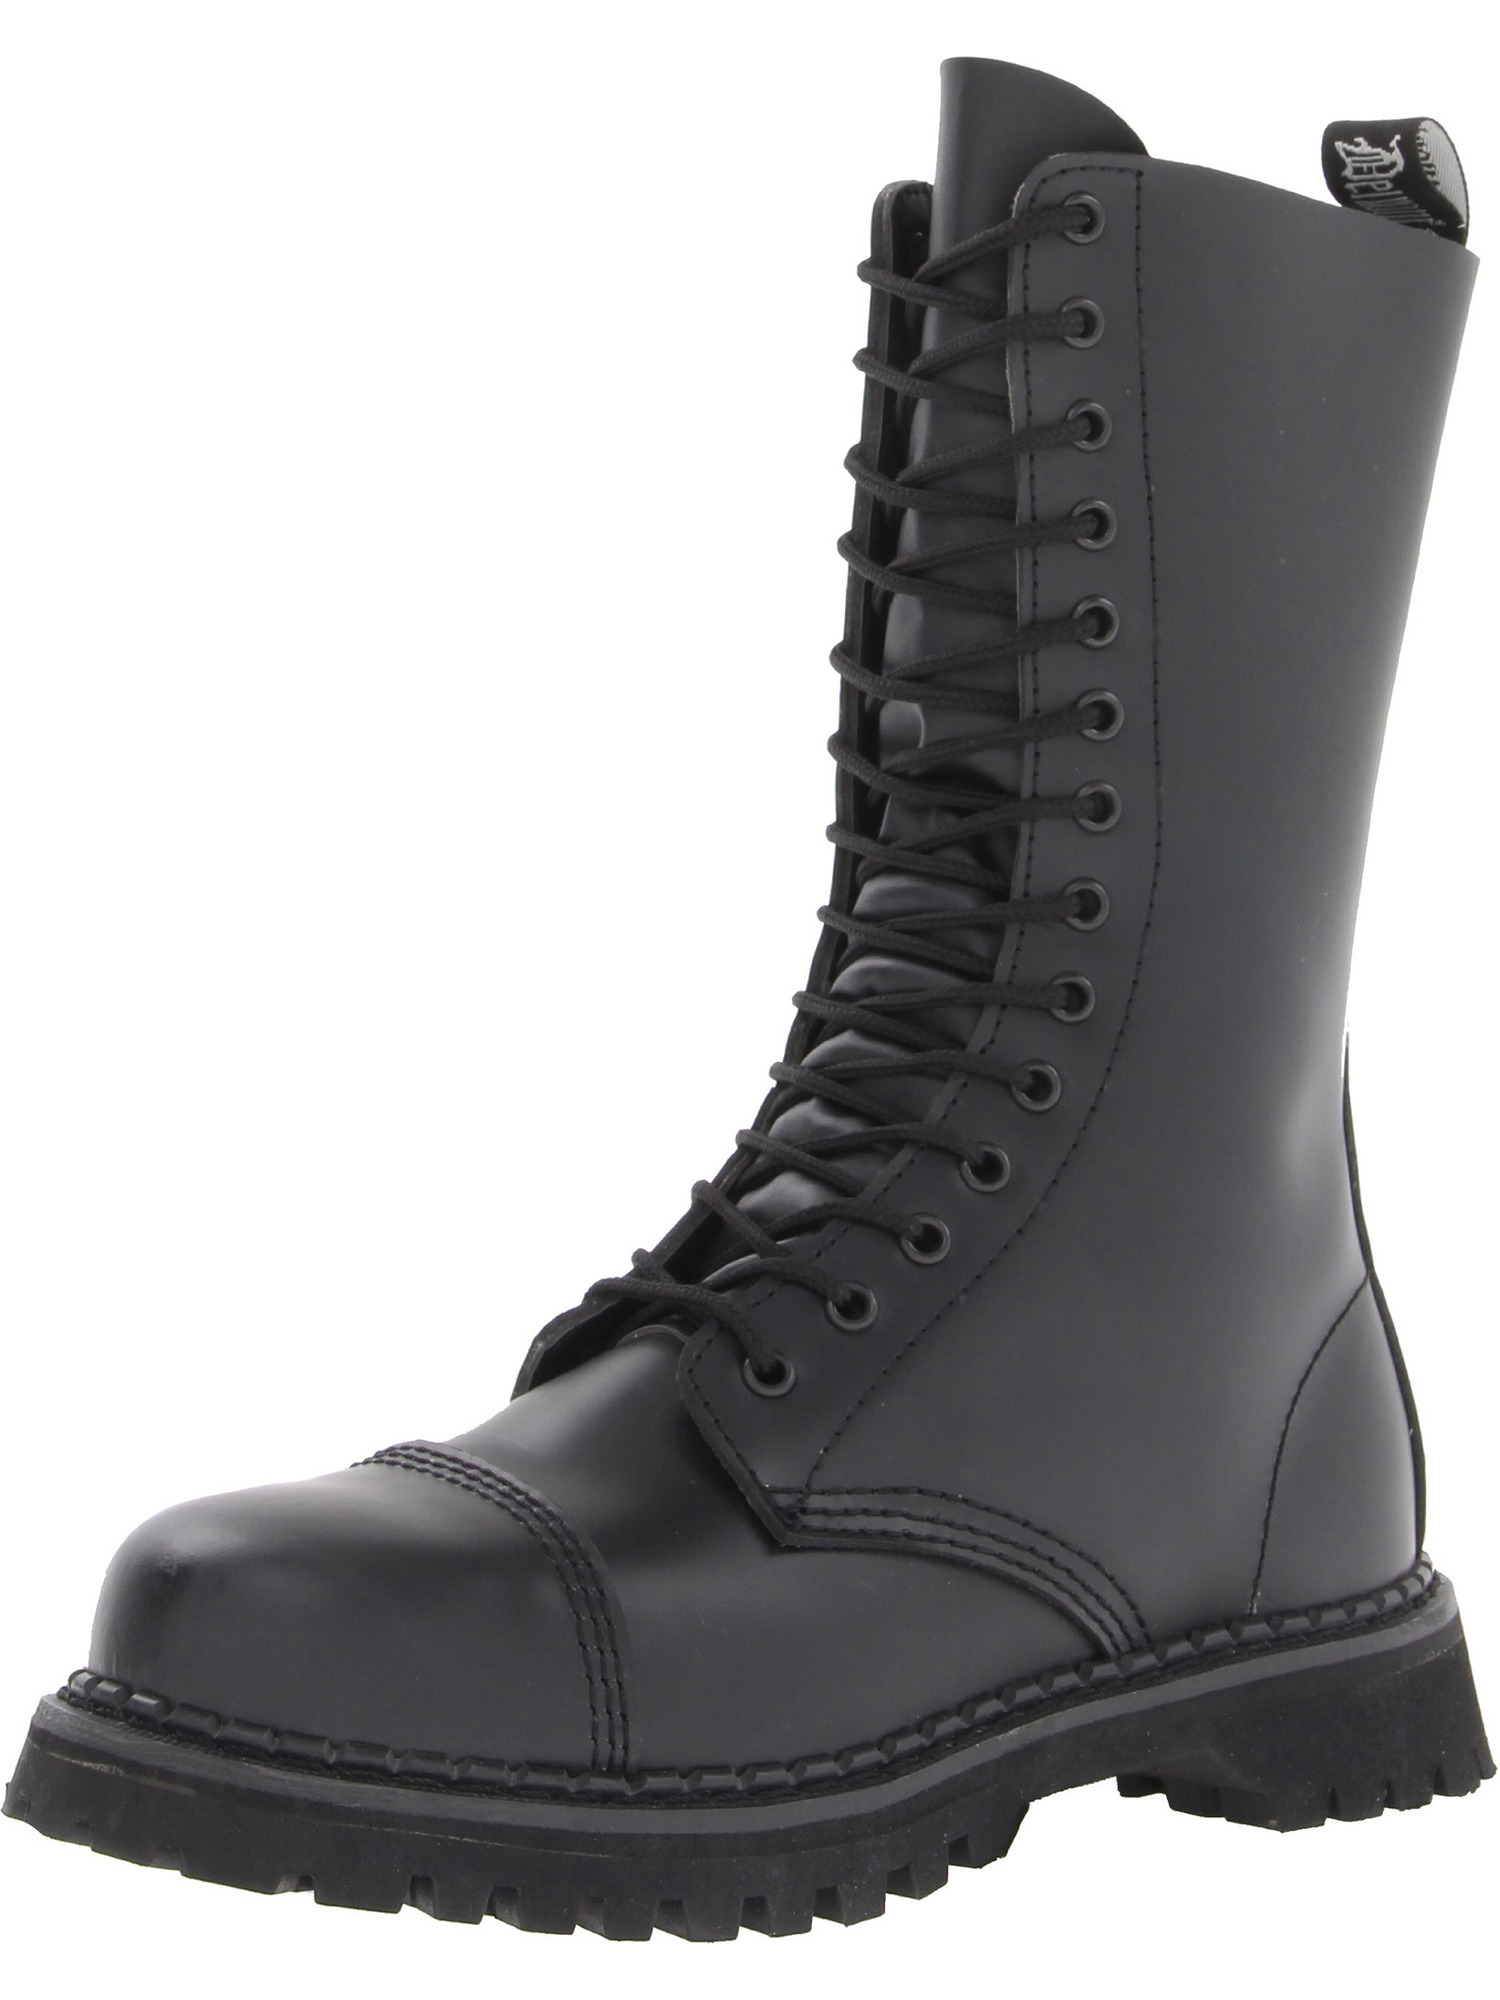 Demonia - Mens Gothic Mid Calf Boots